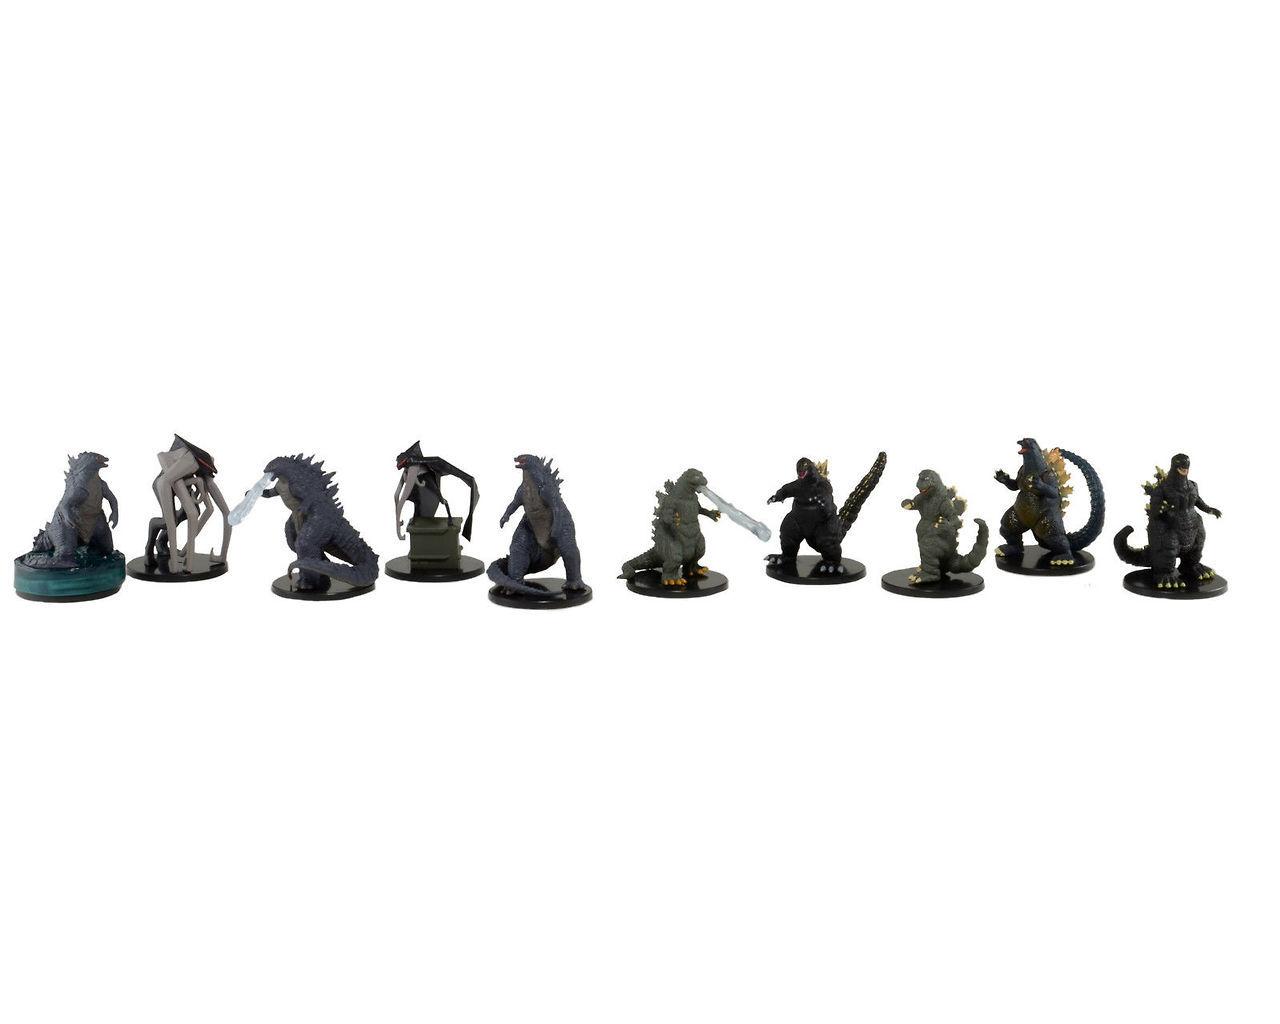 Neca S Mini Godzilla And Muto Figures Revealed